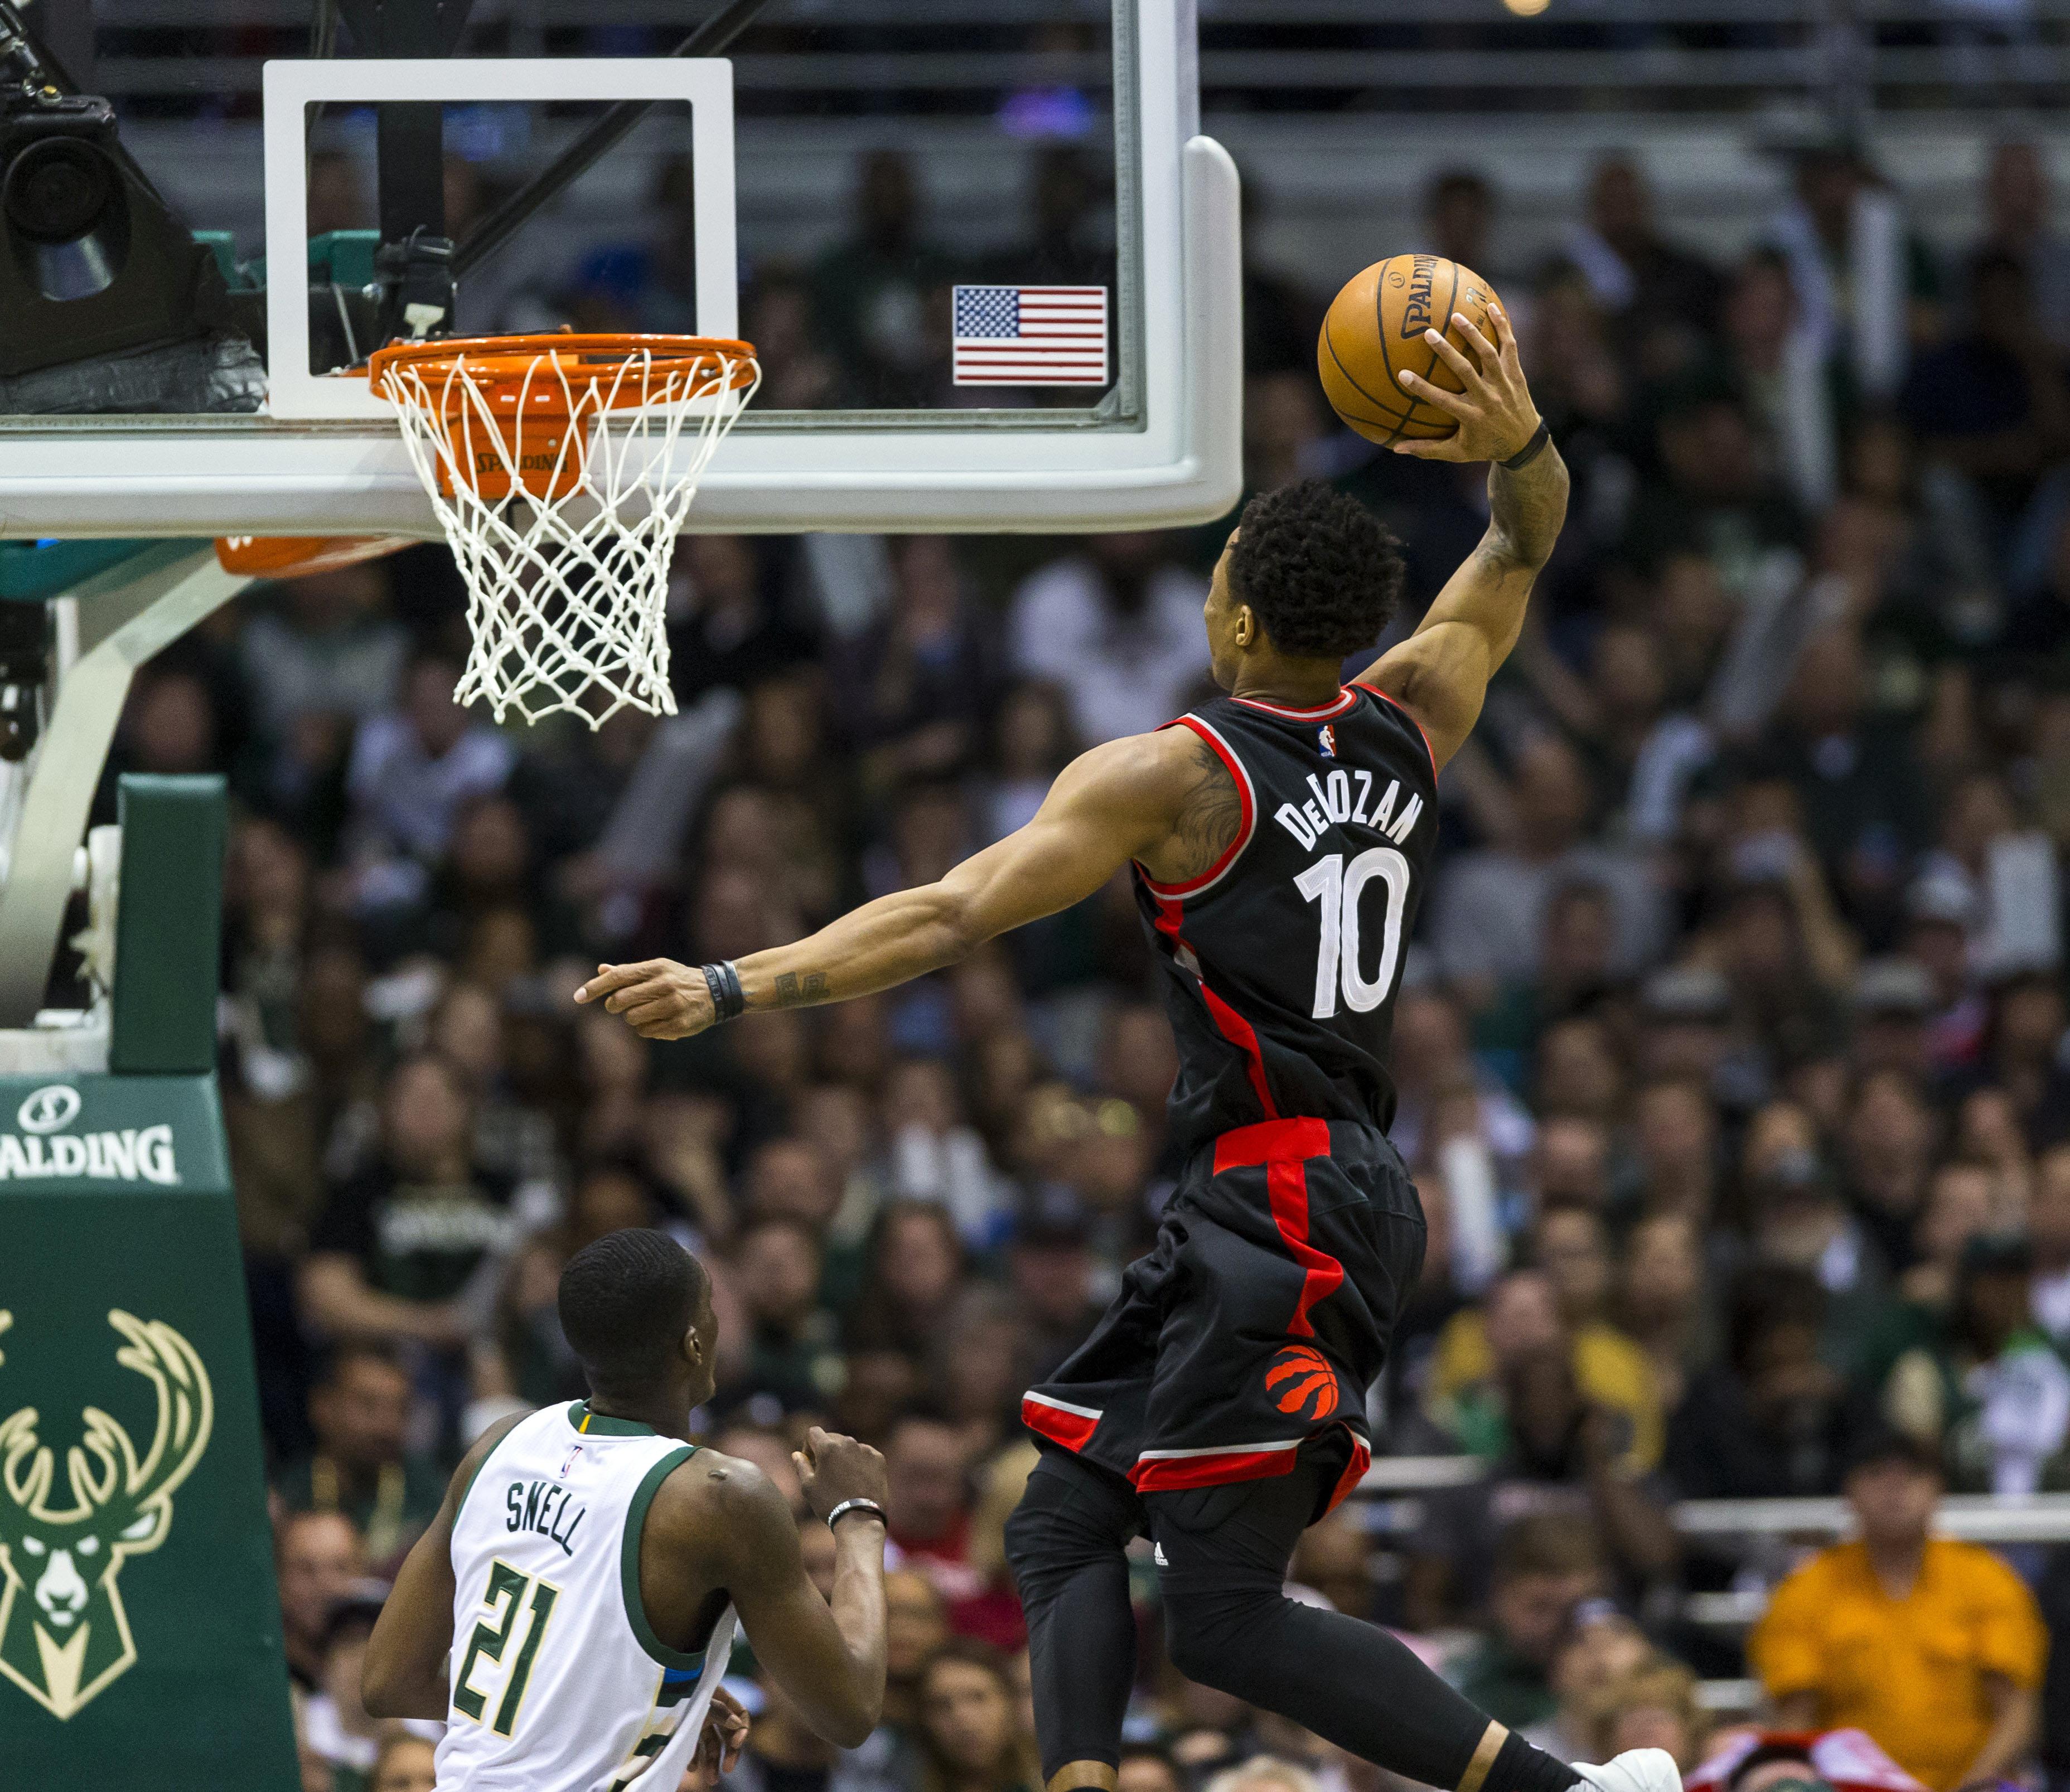 Toronto Raptors 2016-17 Player Grades: The Starters